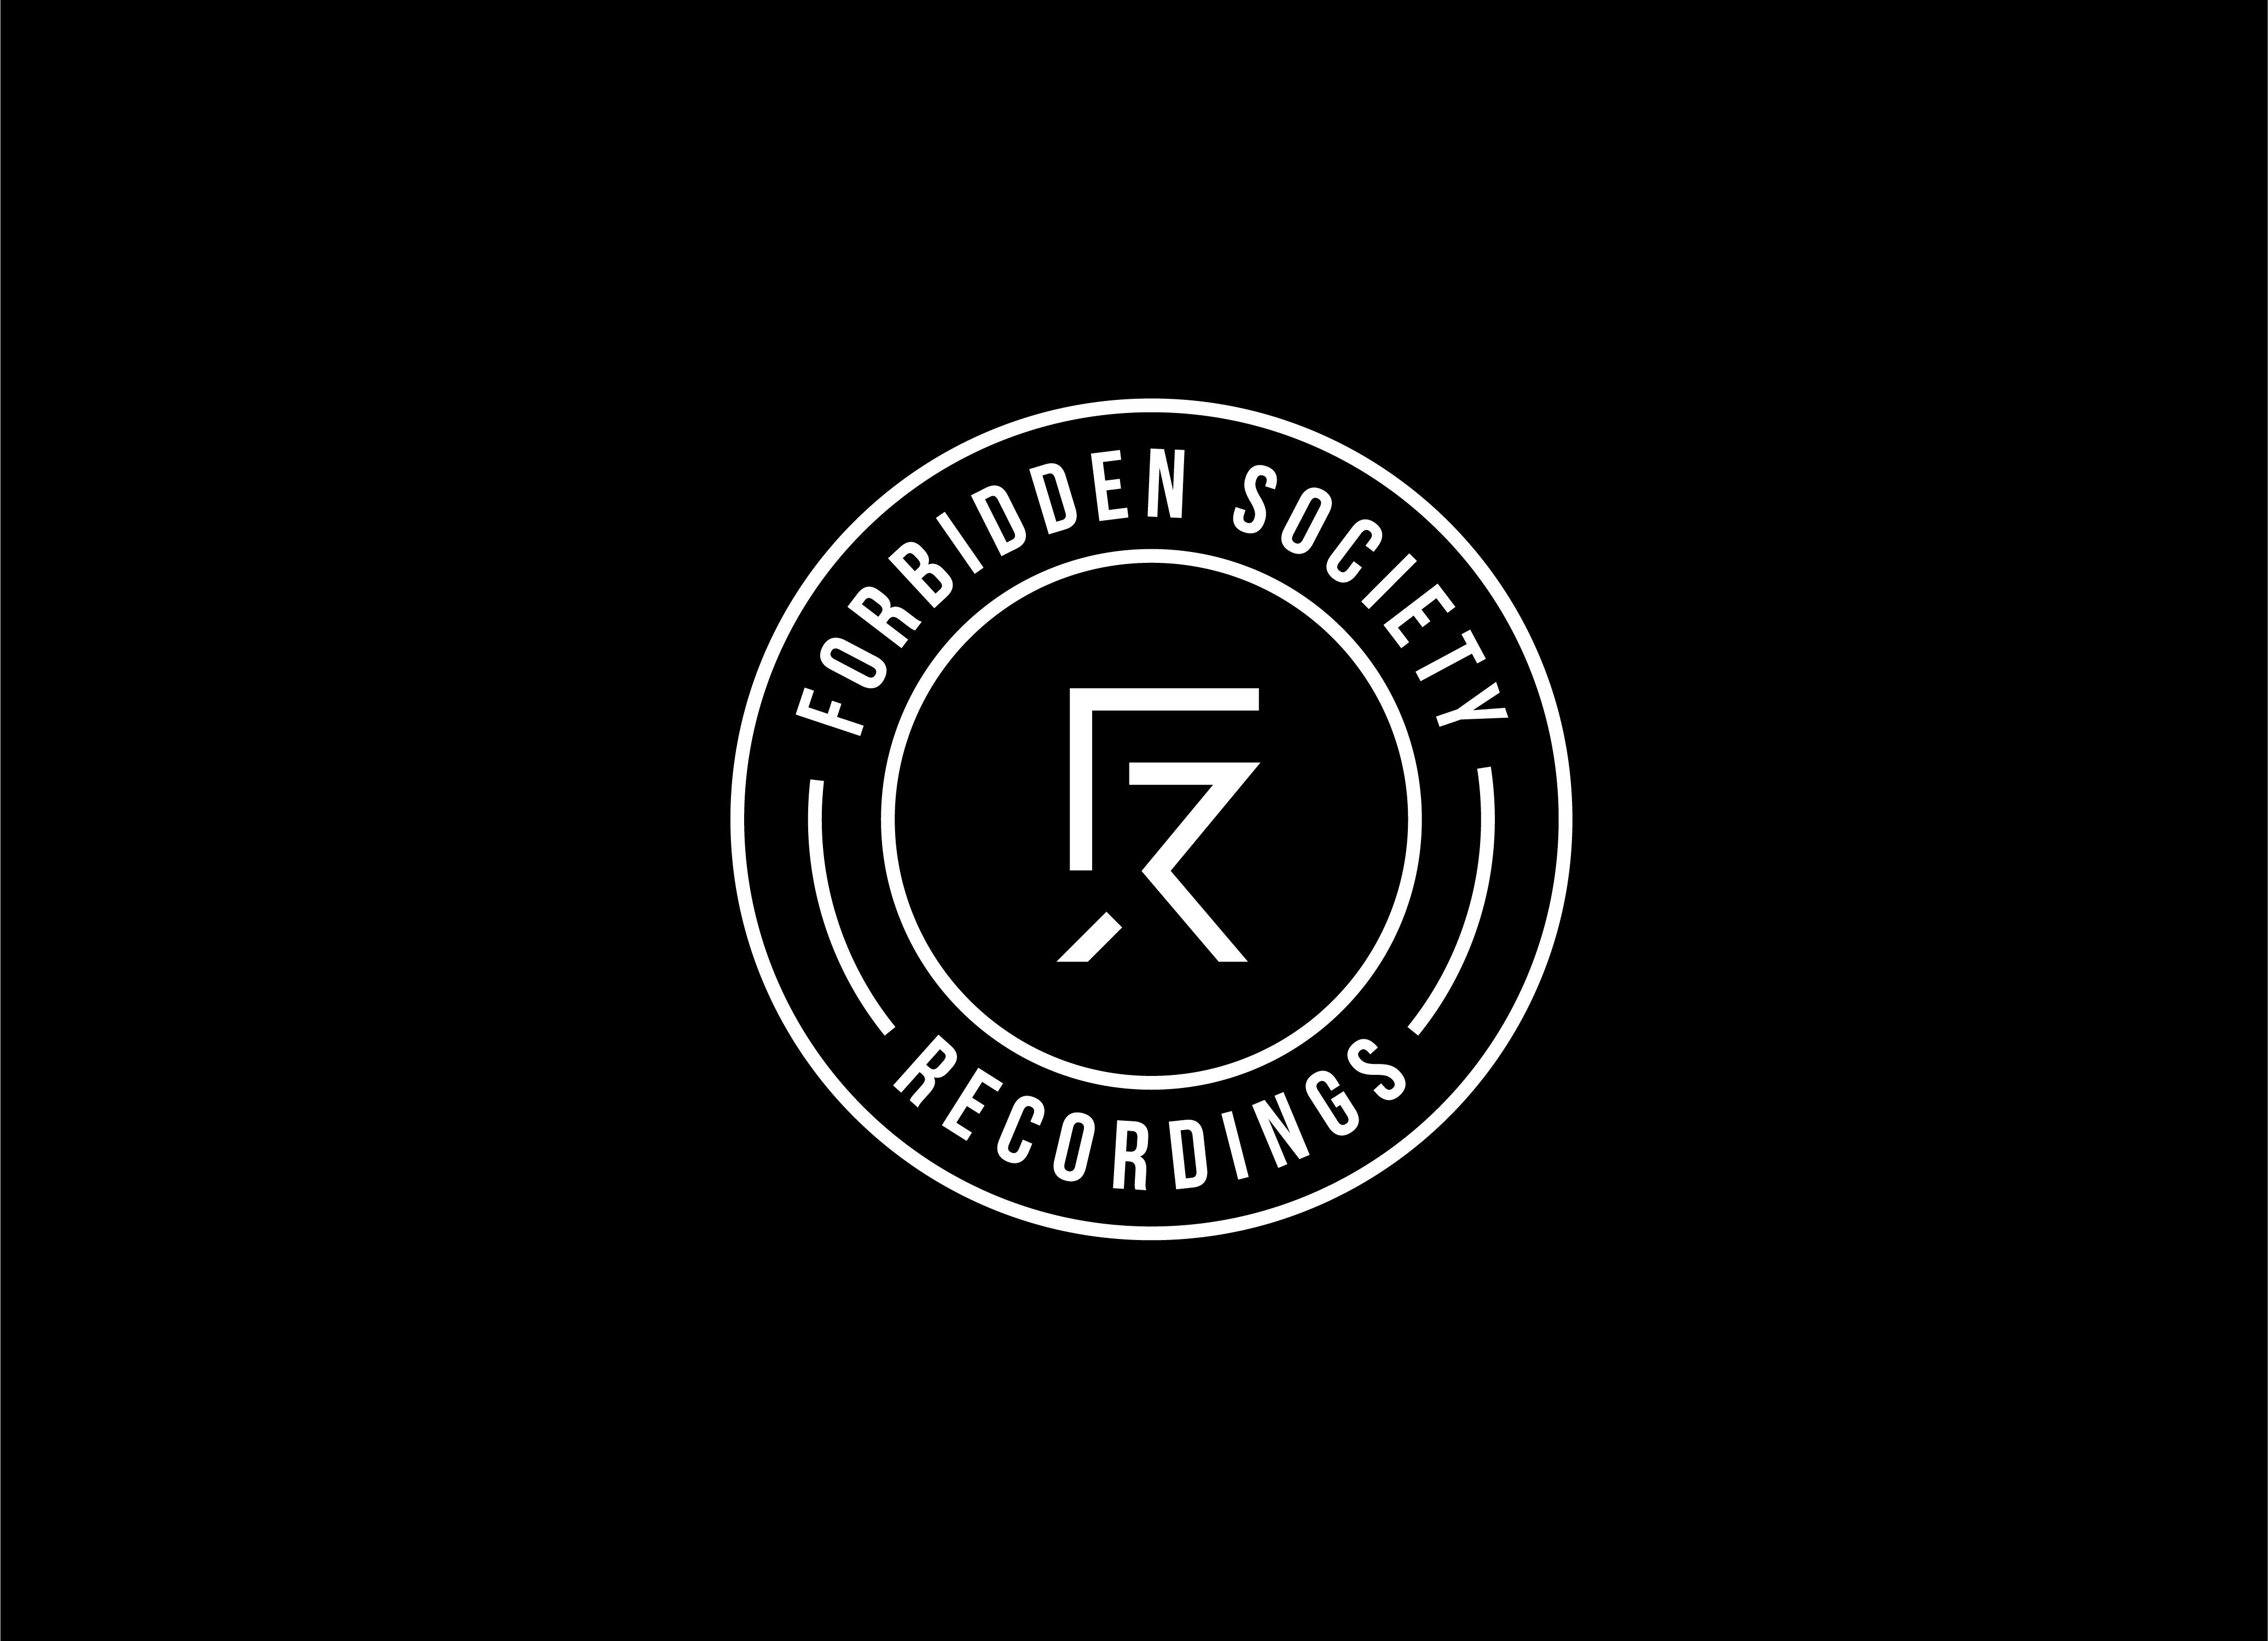 Forbidden Society Recordings  Image